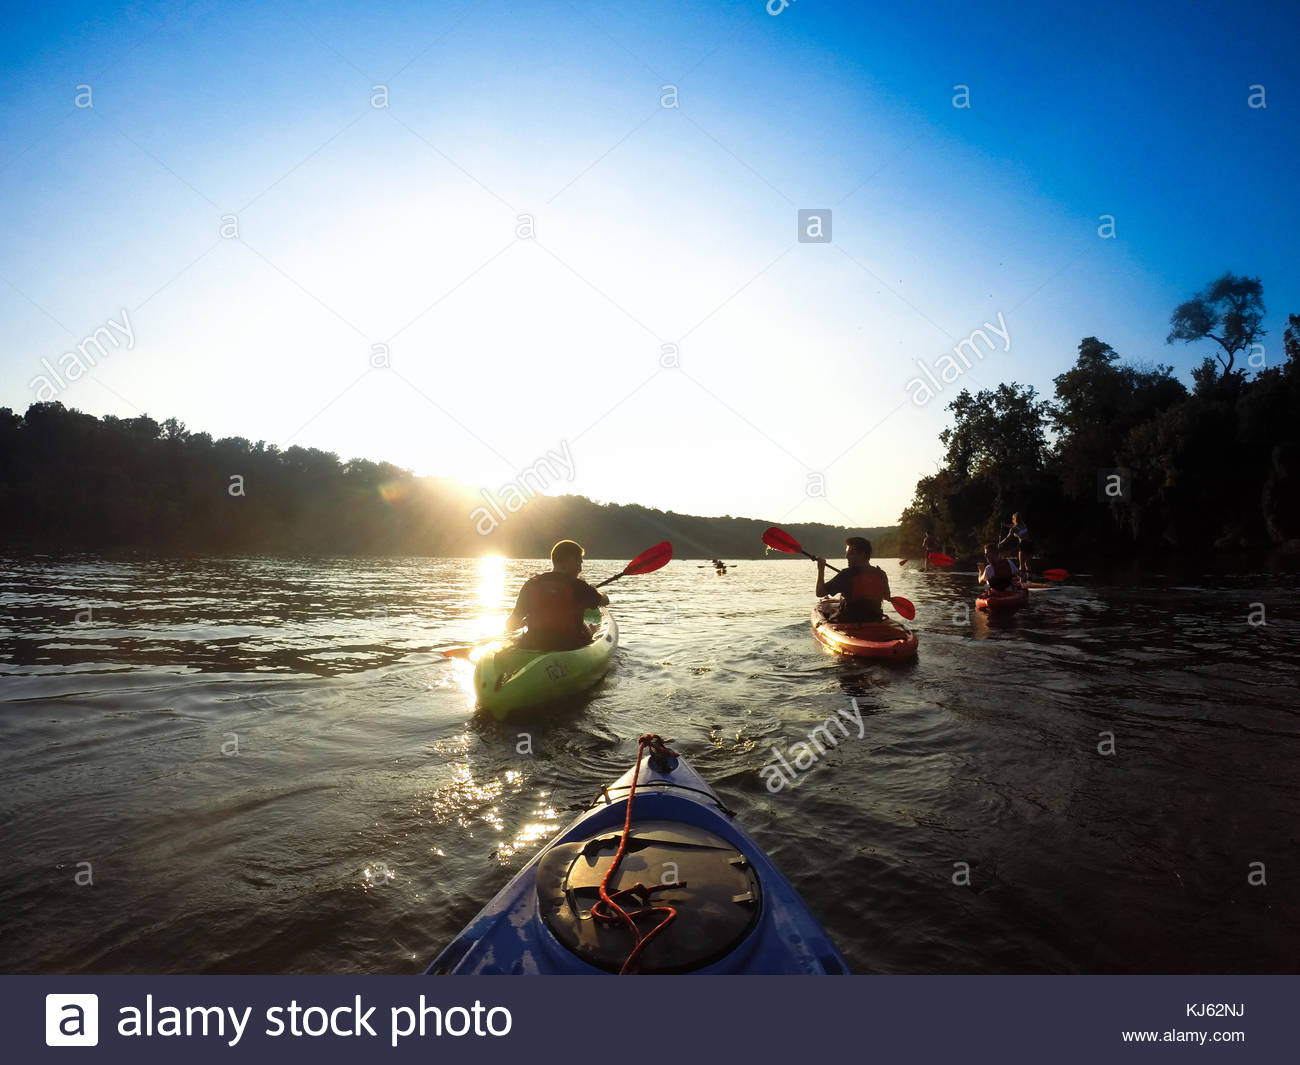 Canoeing - Stock Image